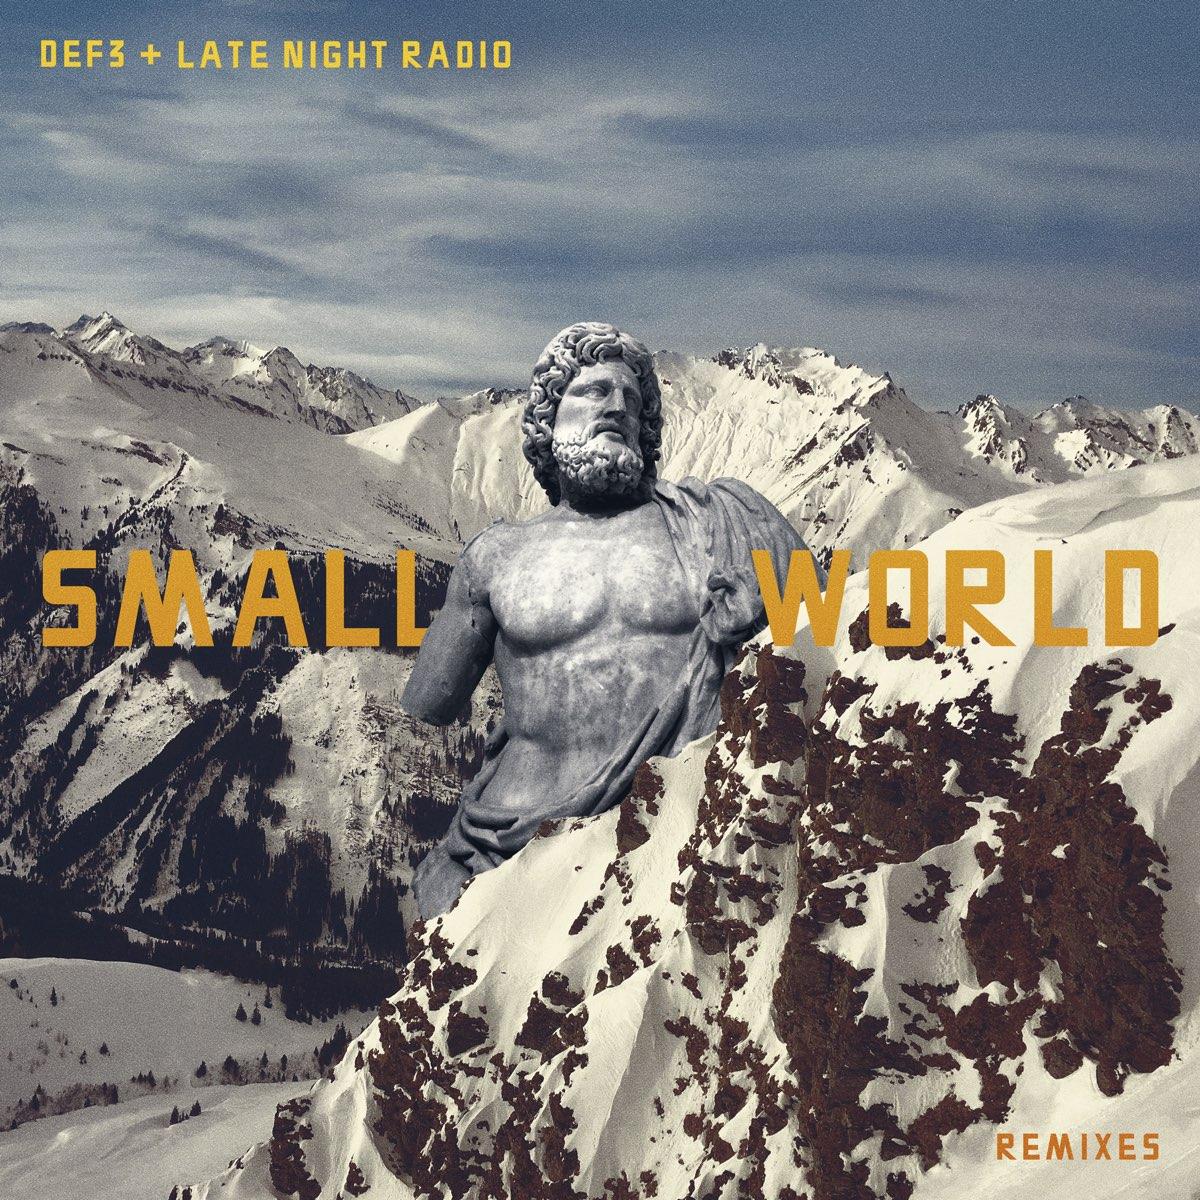 Def3 - Small World Remixes